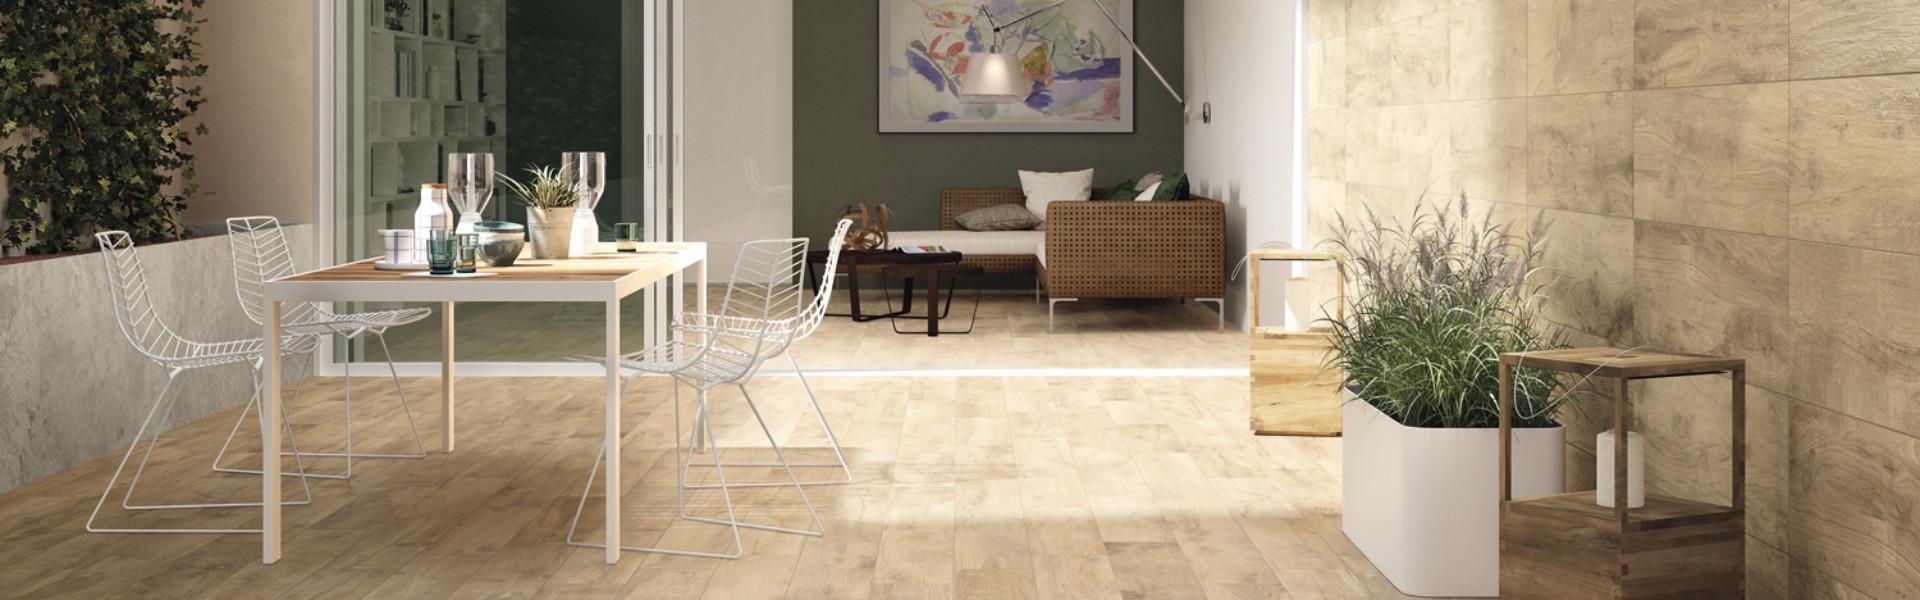 Castelvetro Woodland Elm 04 Esterno Interno NEW new